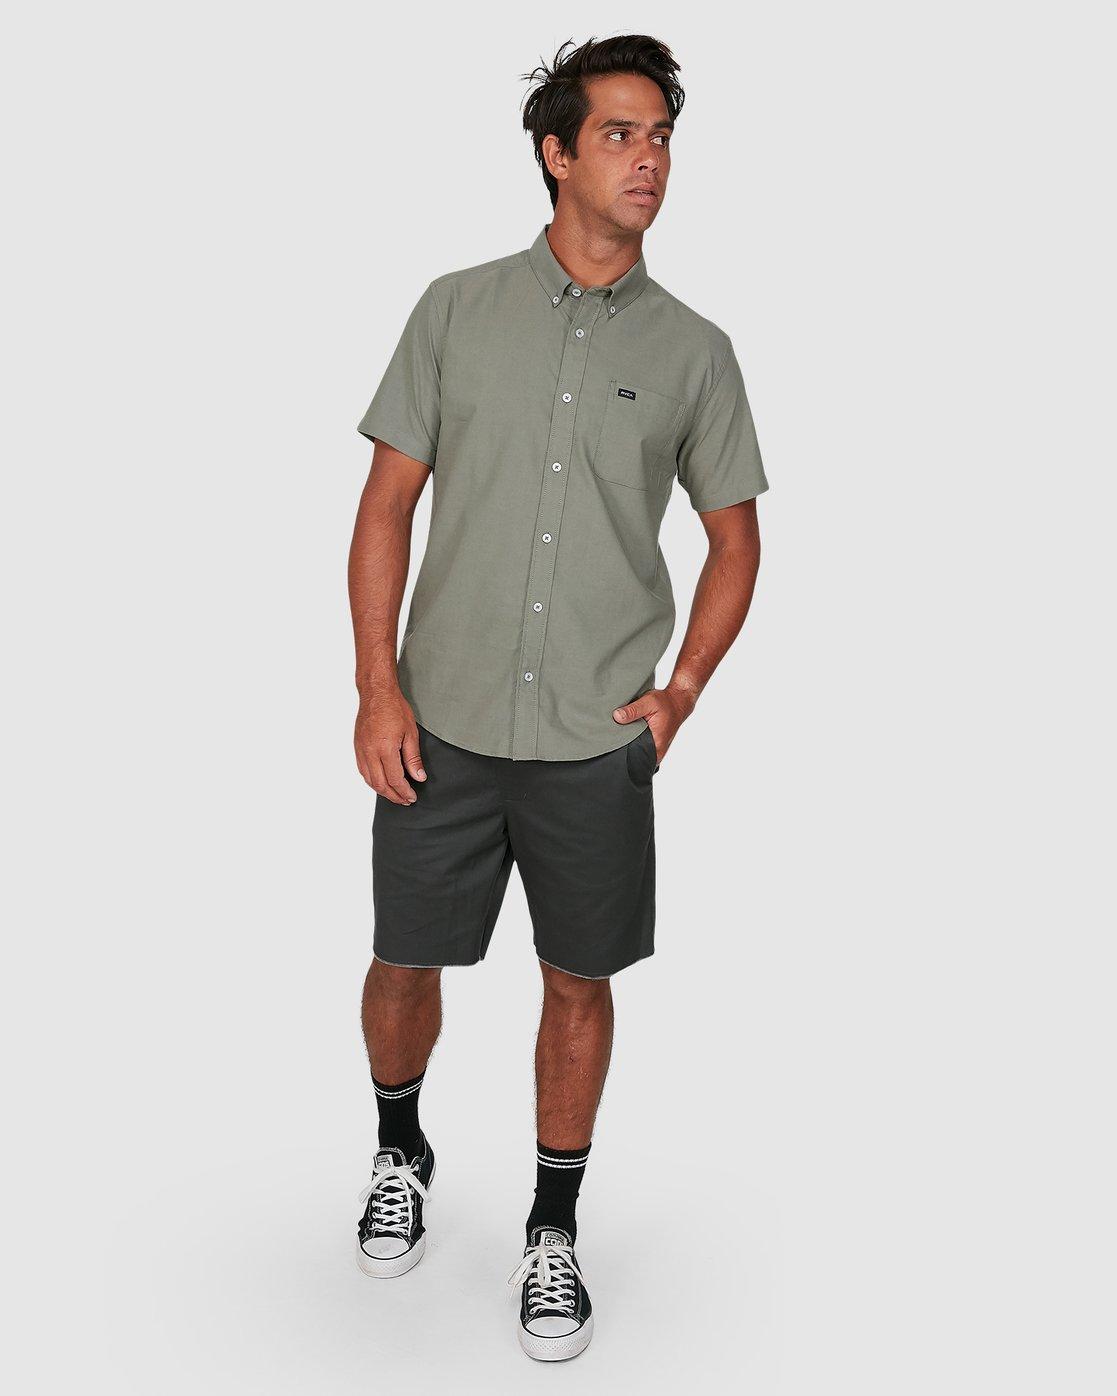 5 Thatll Do Stretch Short Sleeve Shirt Green R382185 RVCA